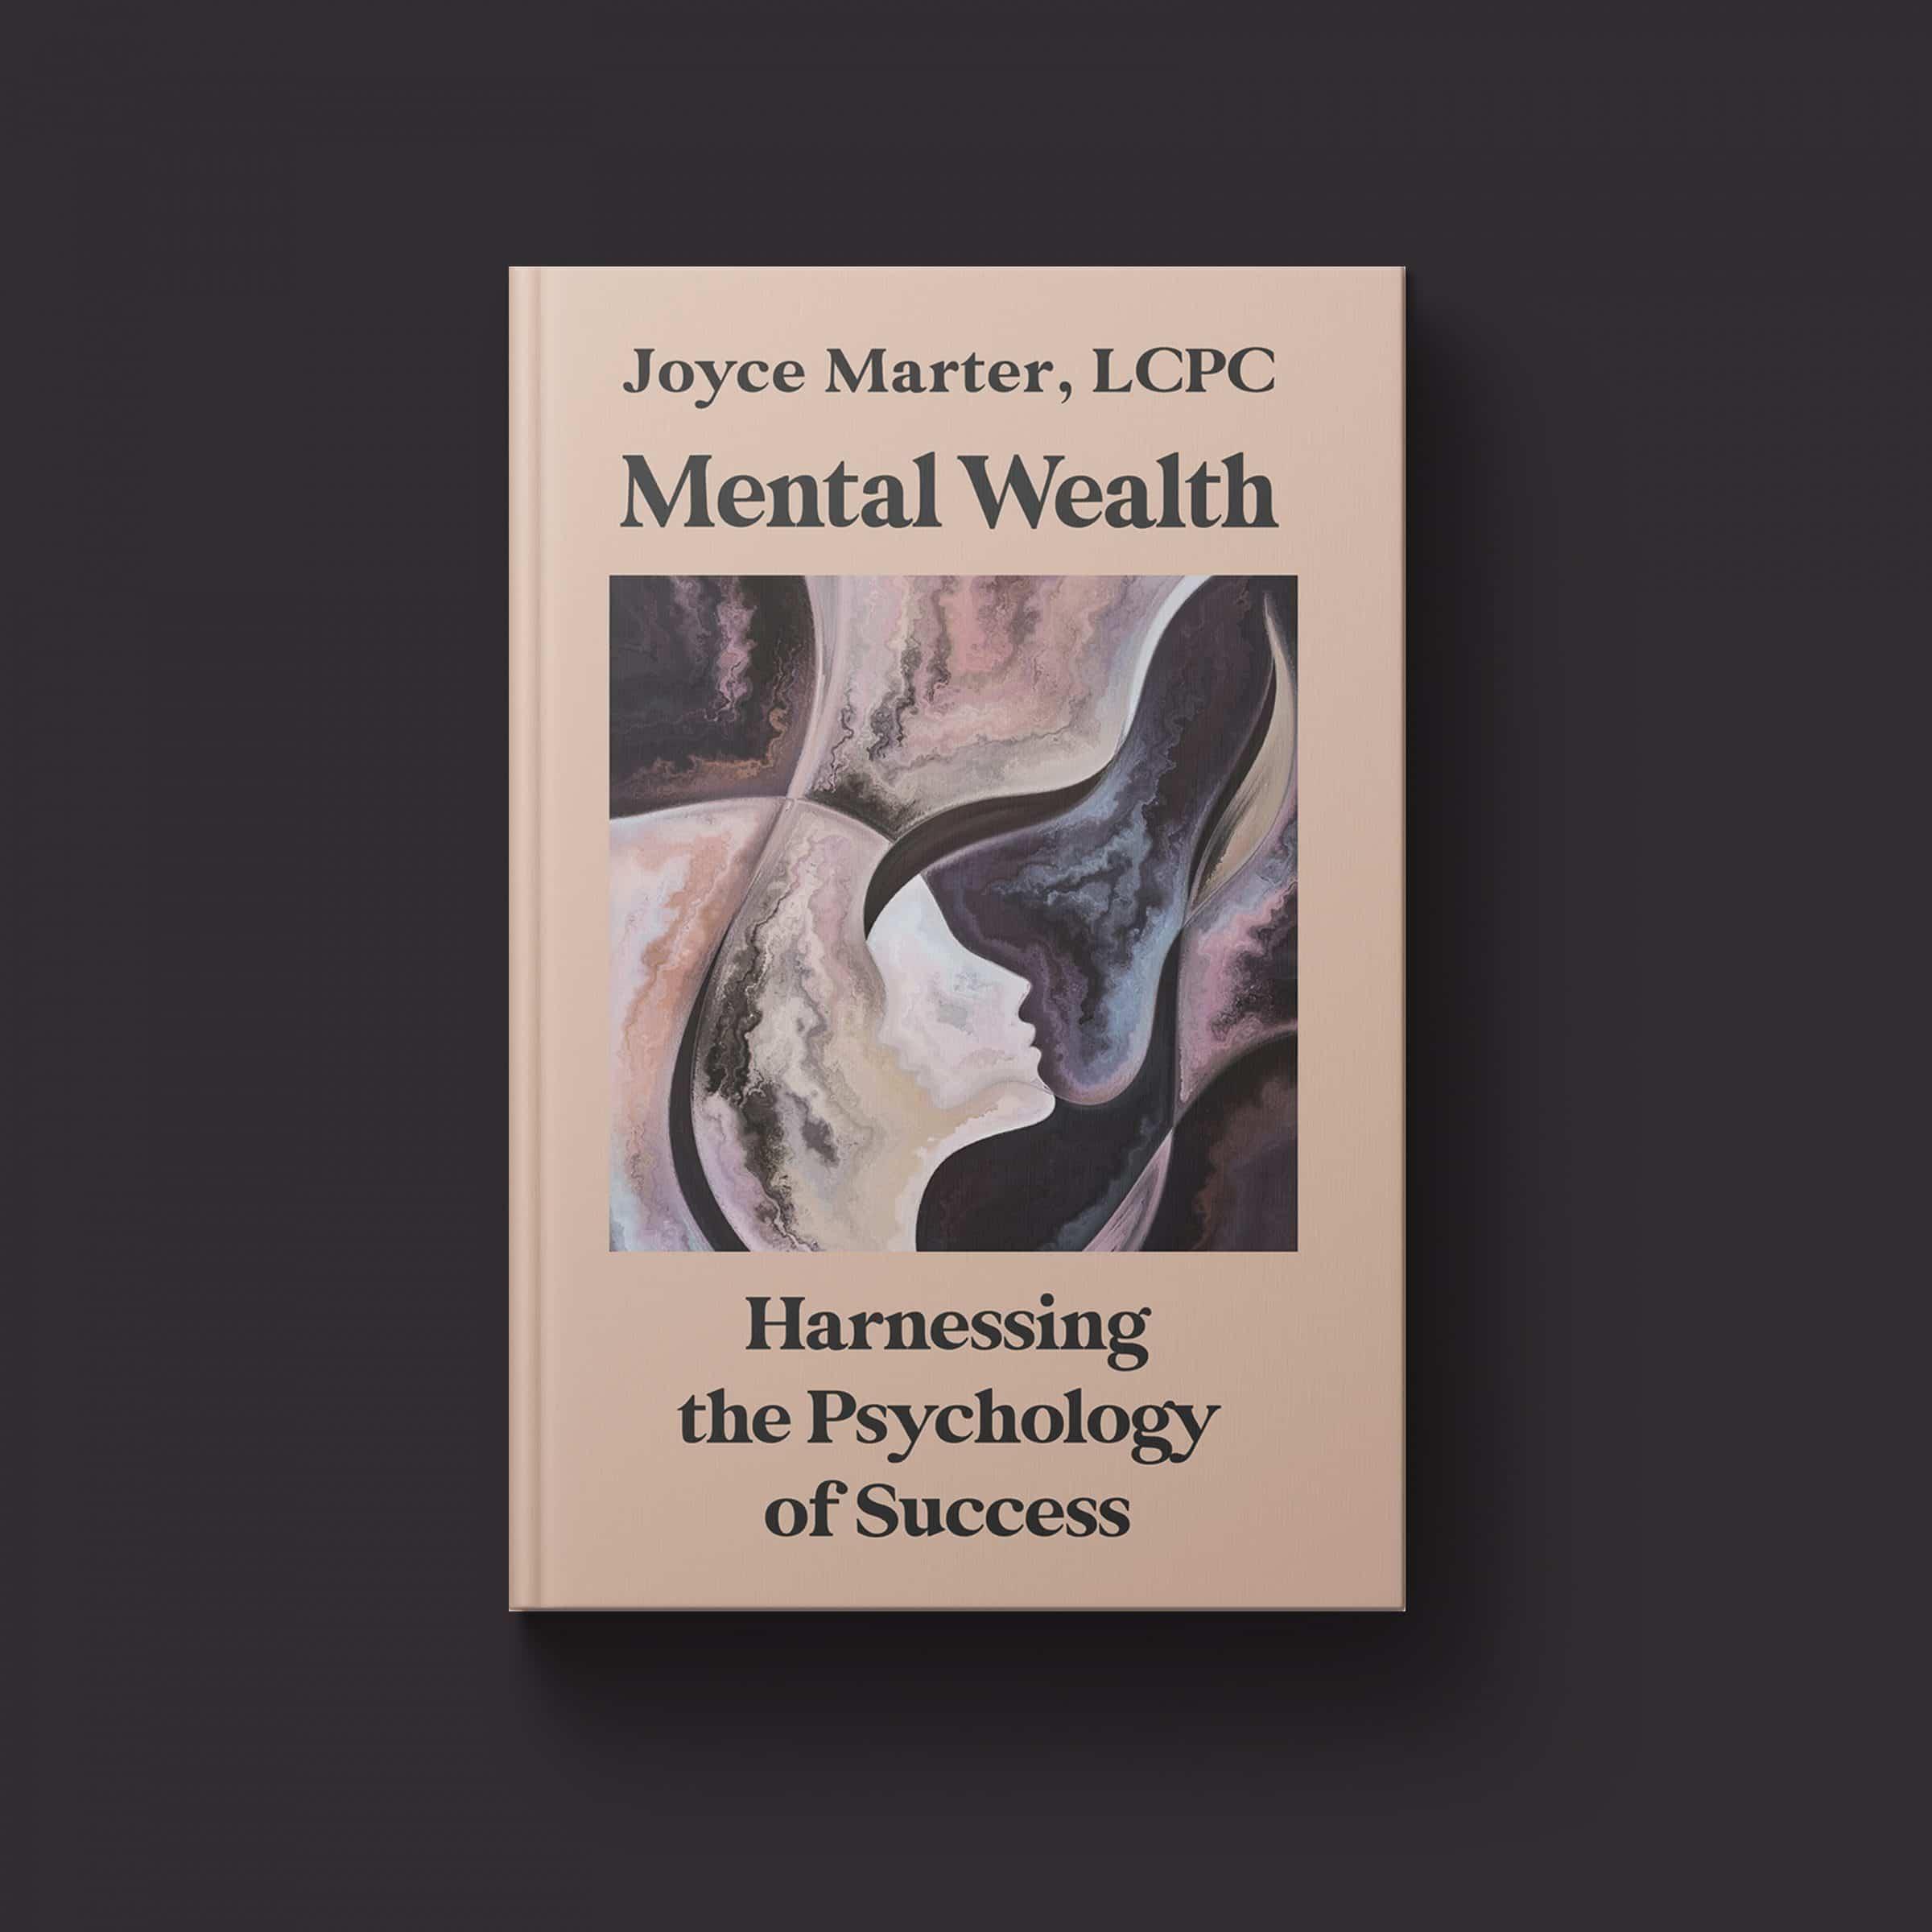 mental-wealth-joyce-marter-cover-art-2